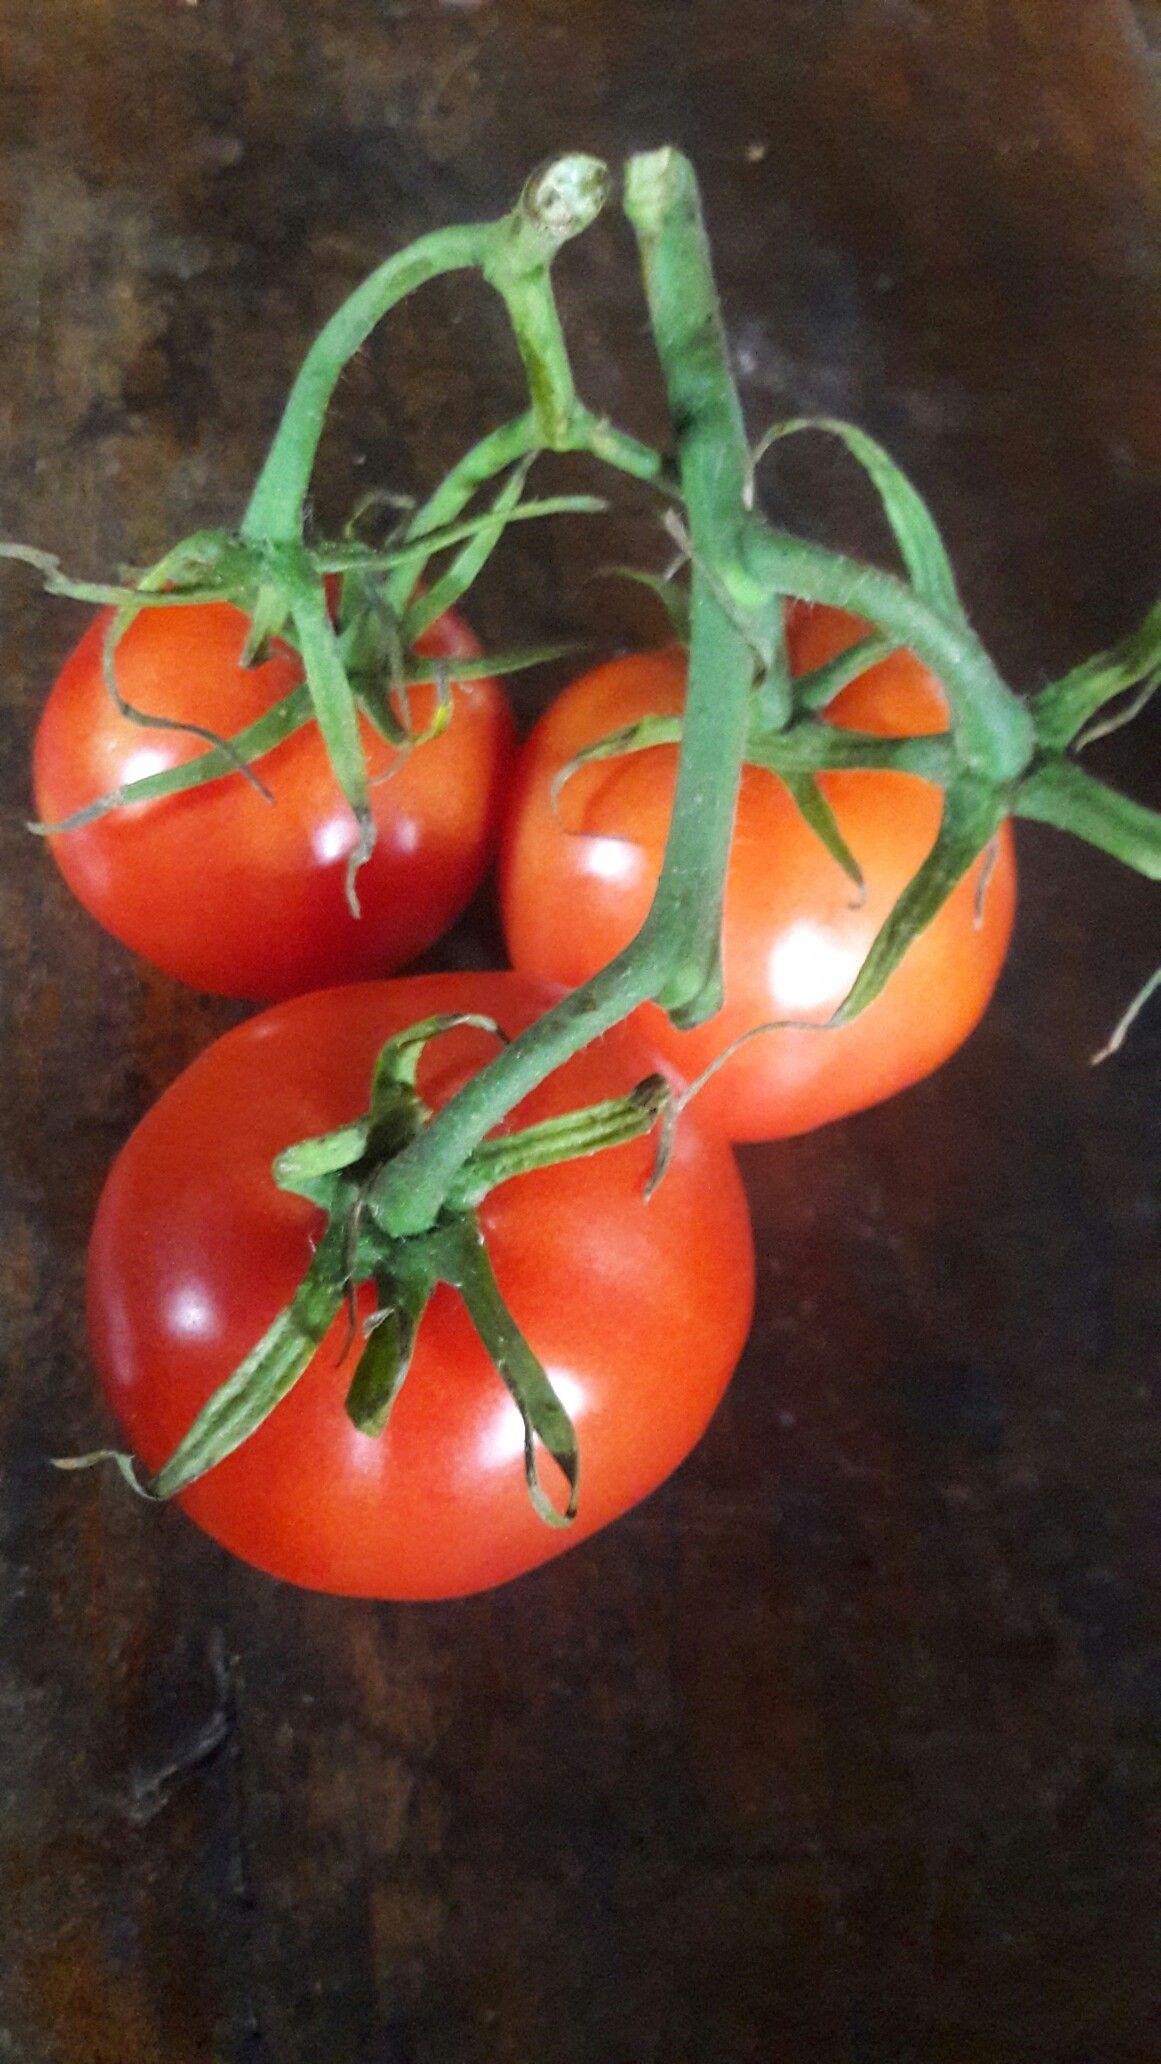 Tomates cosecha de Guatemala